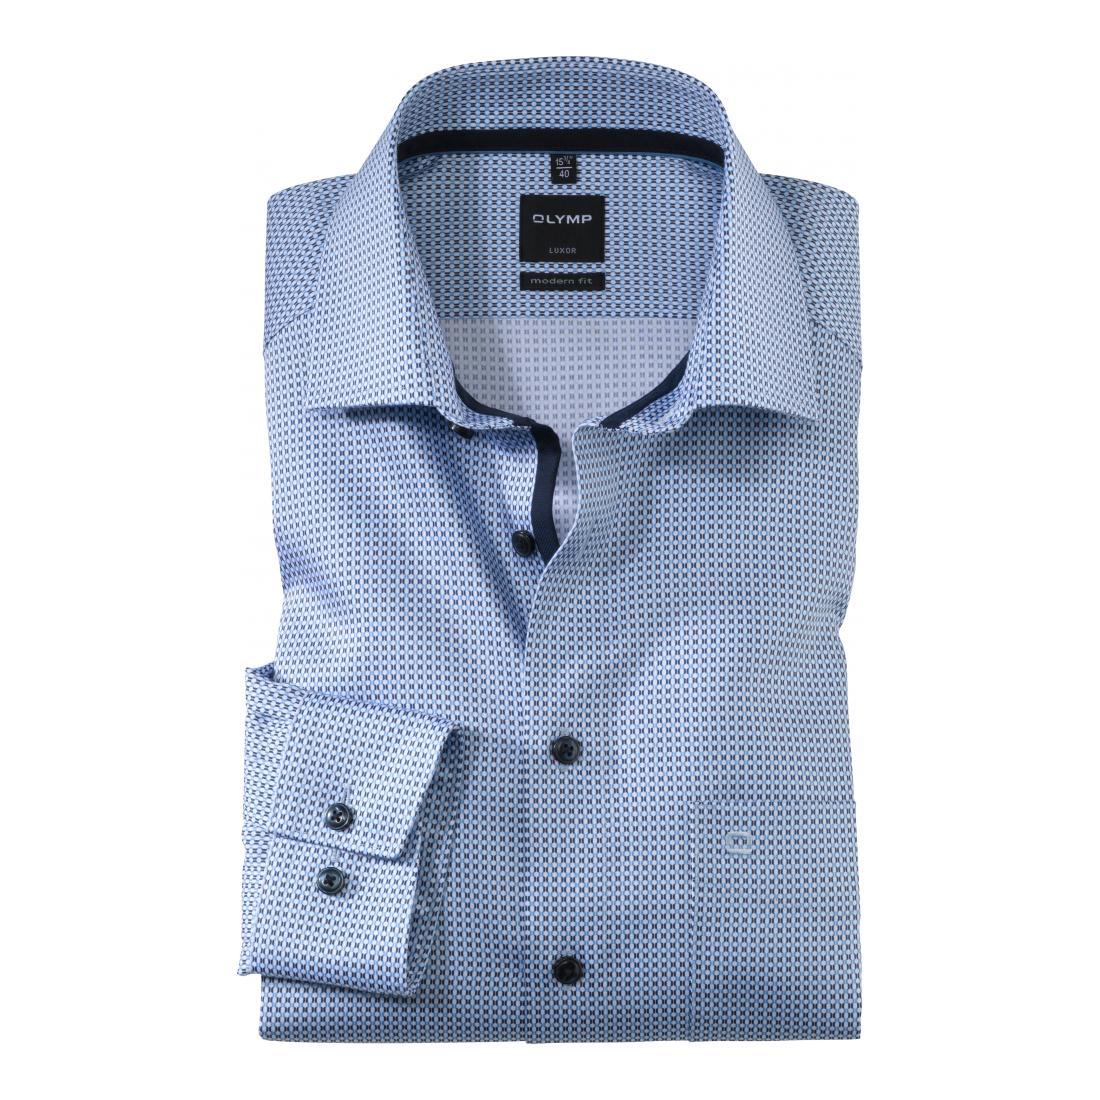 Olymp Business Hemden Herren 1381/74 Hemden